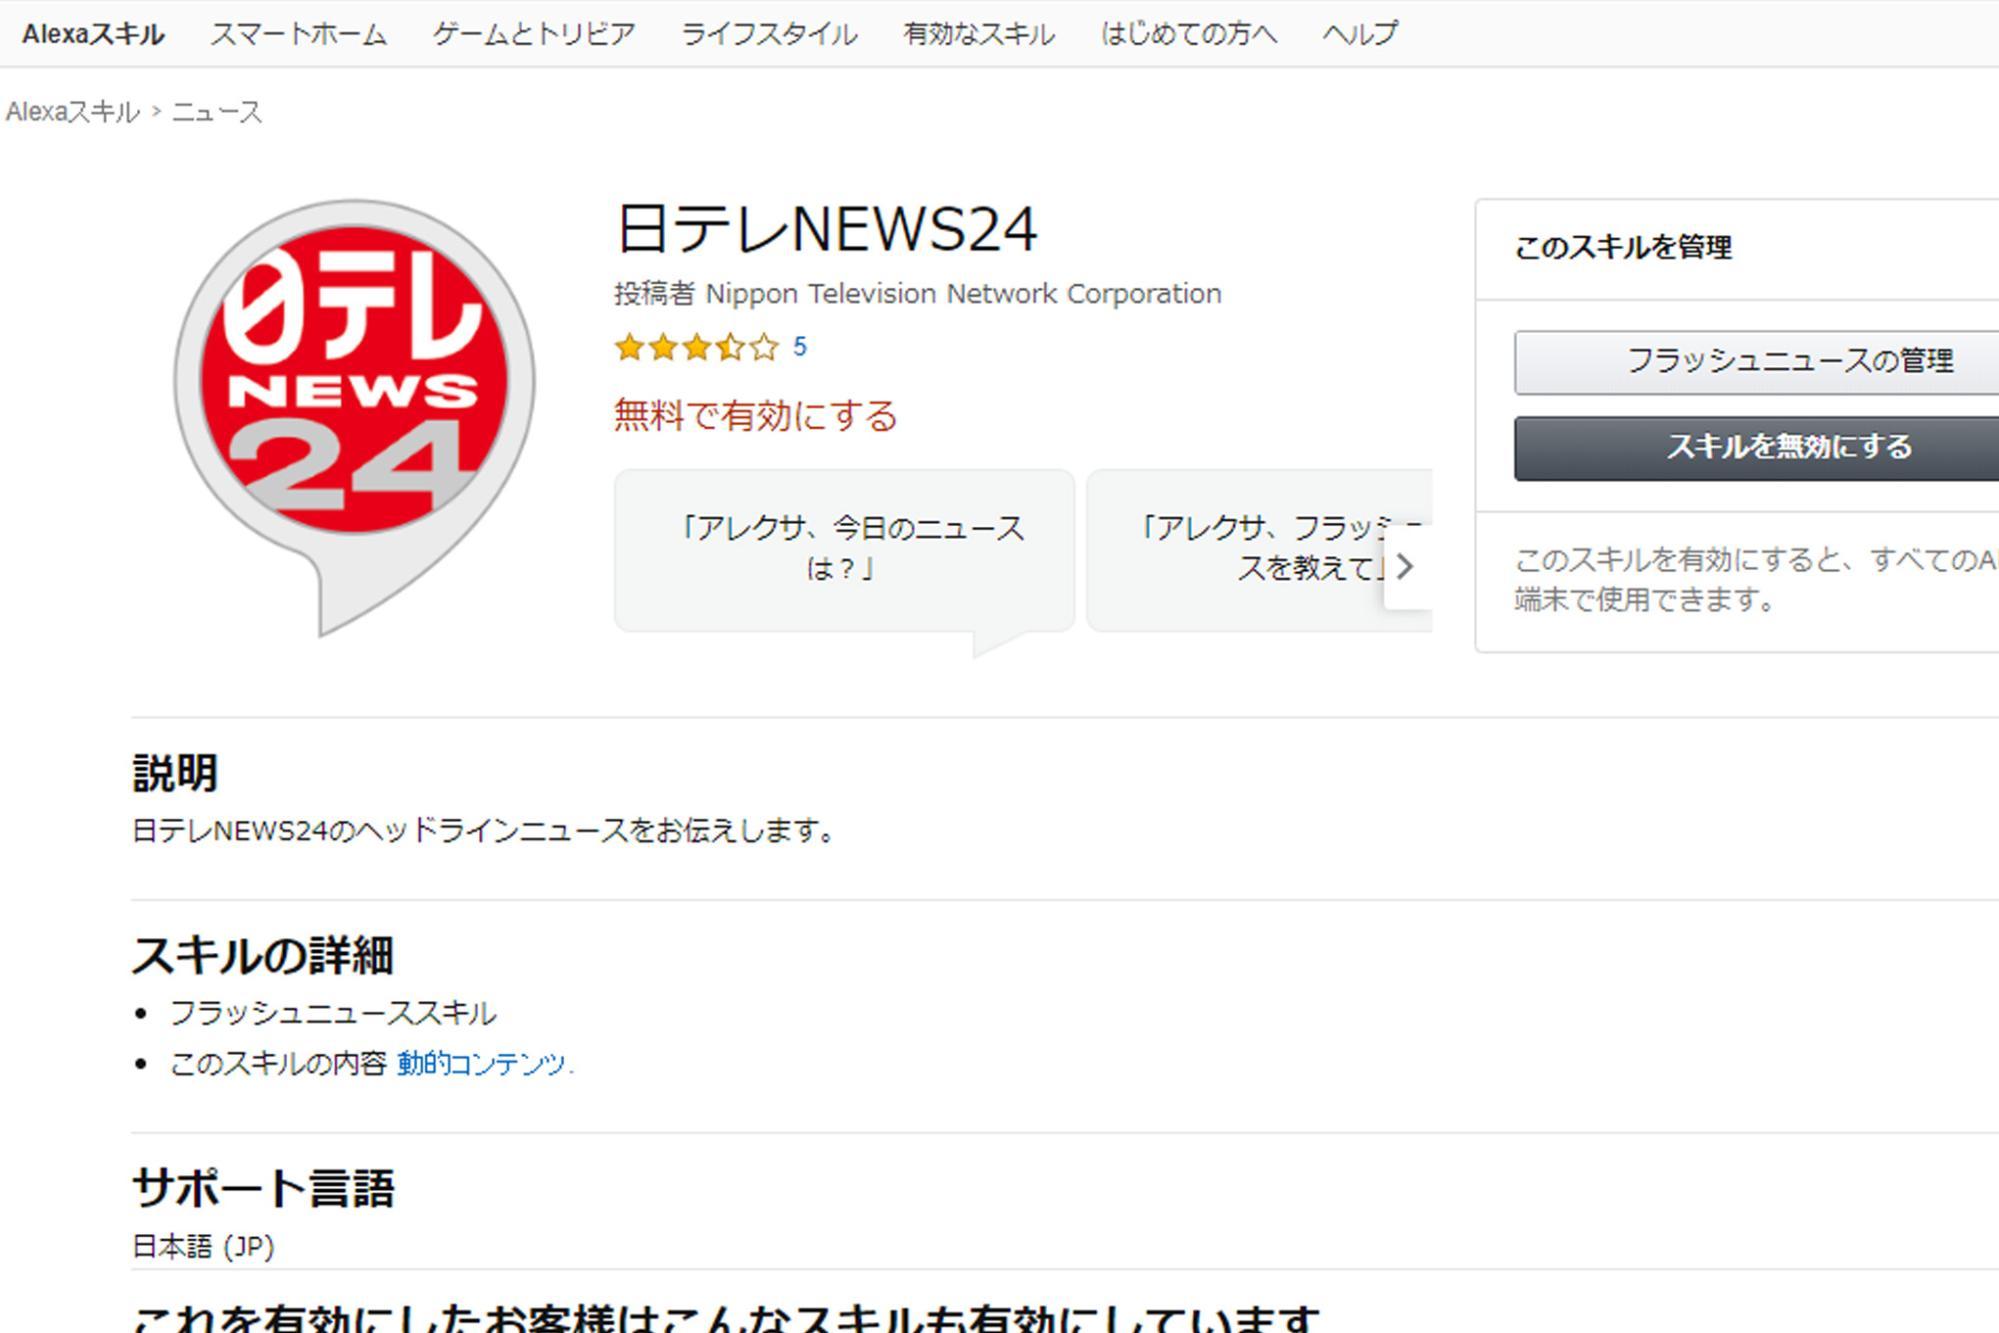 AmazonEchoスキル「日テレNeWS24」